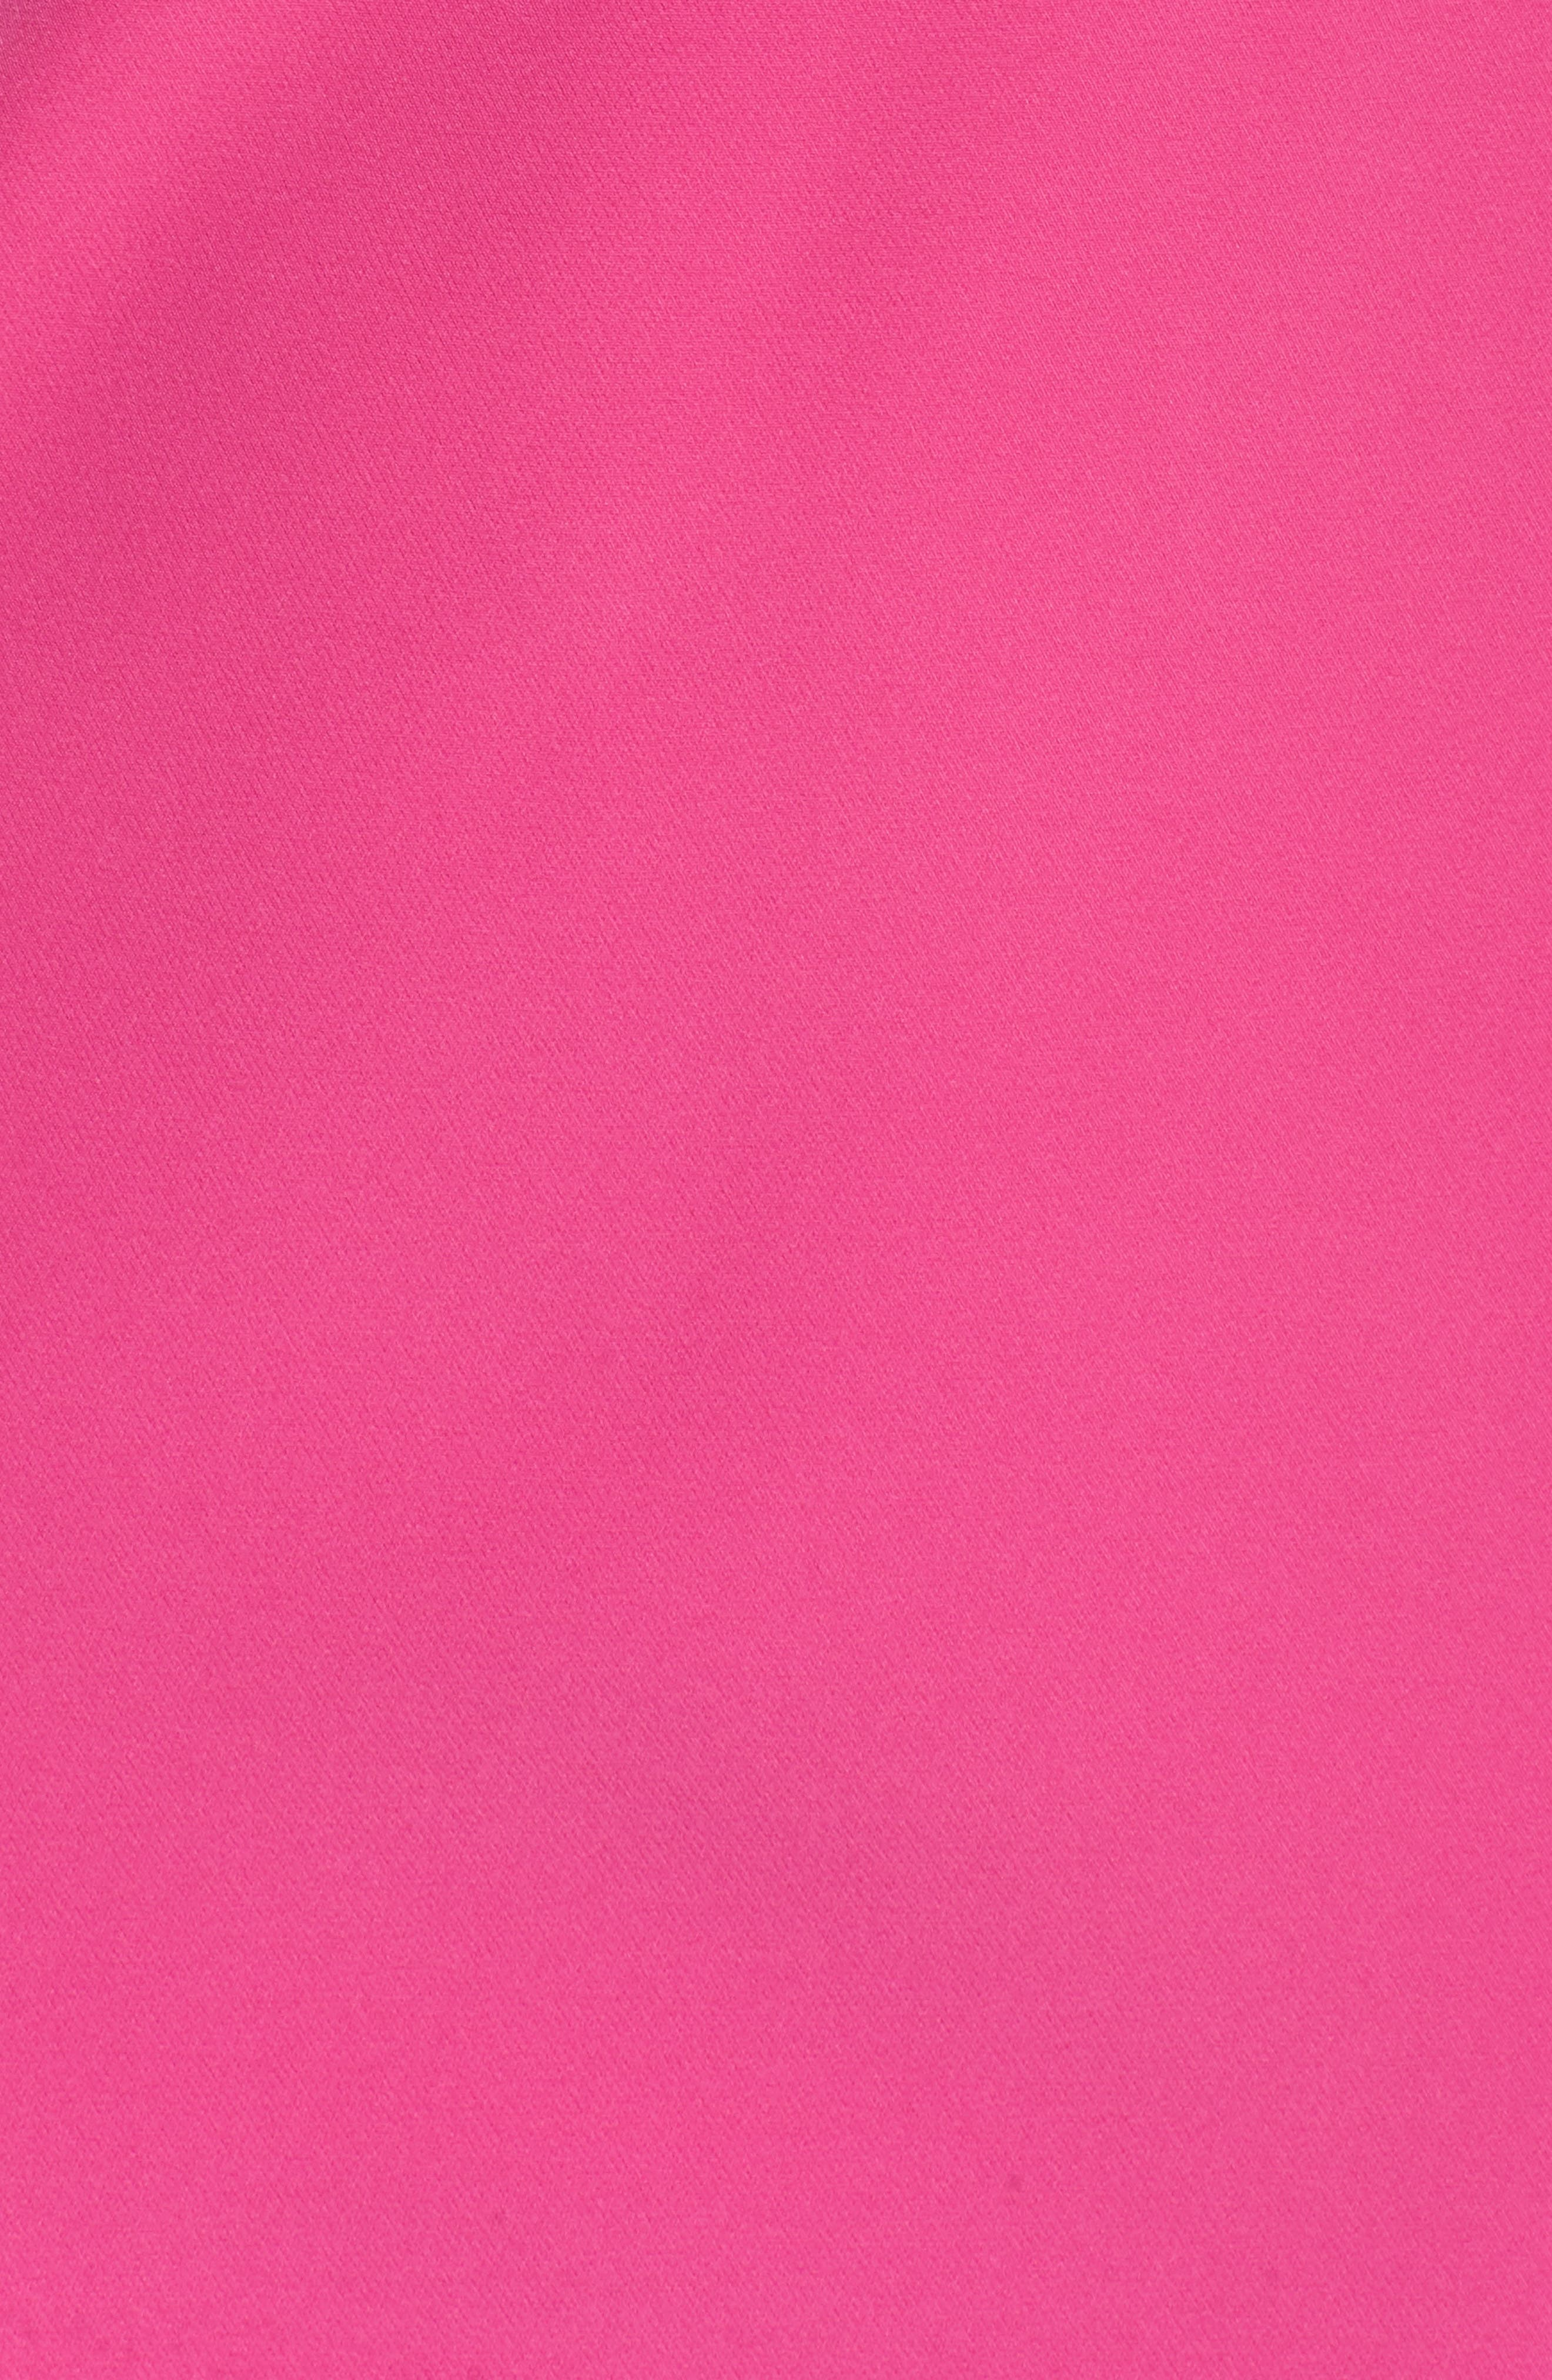 One Shoulder Bow Sheath Dress,                             Alternate thumbnail 5, color,                             Fuchsia